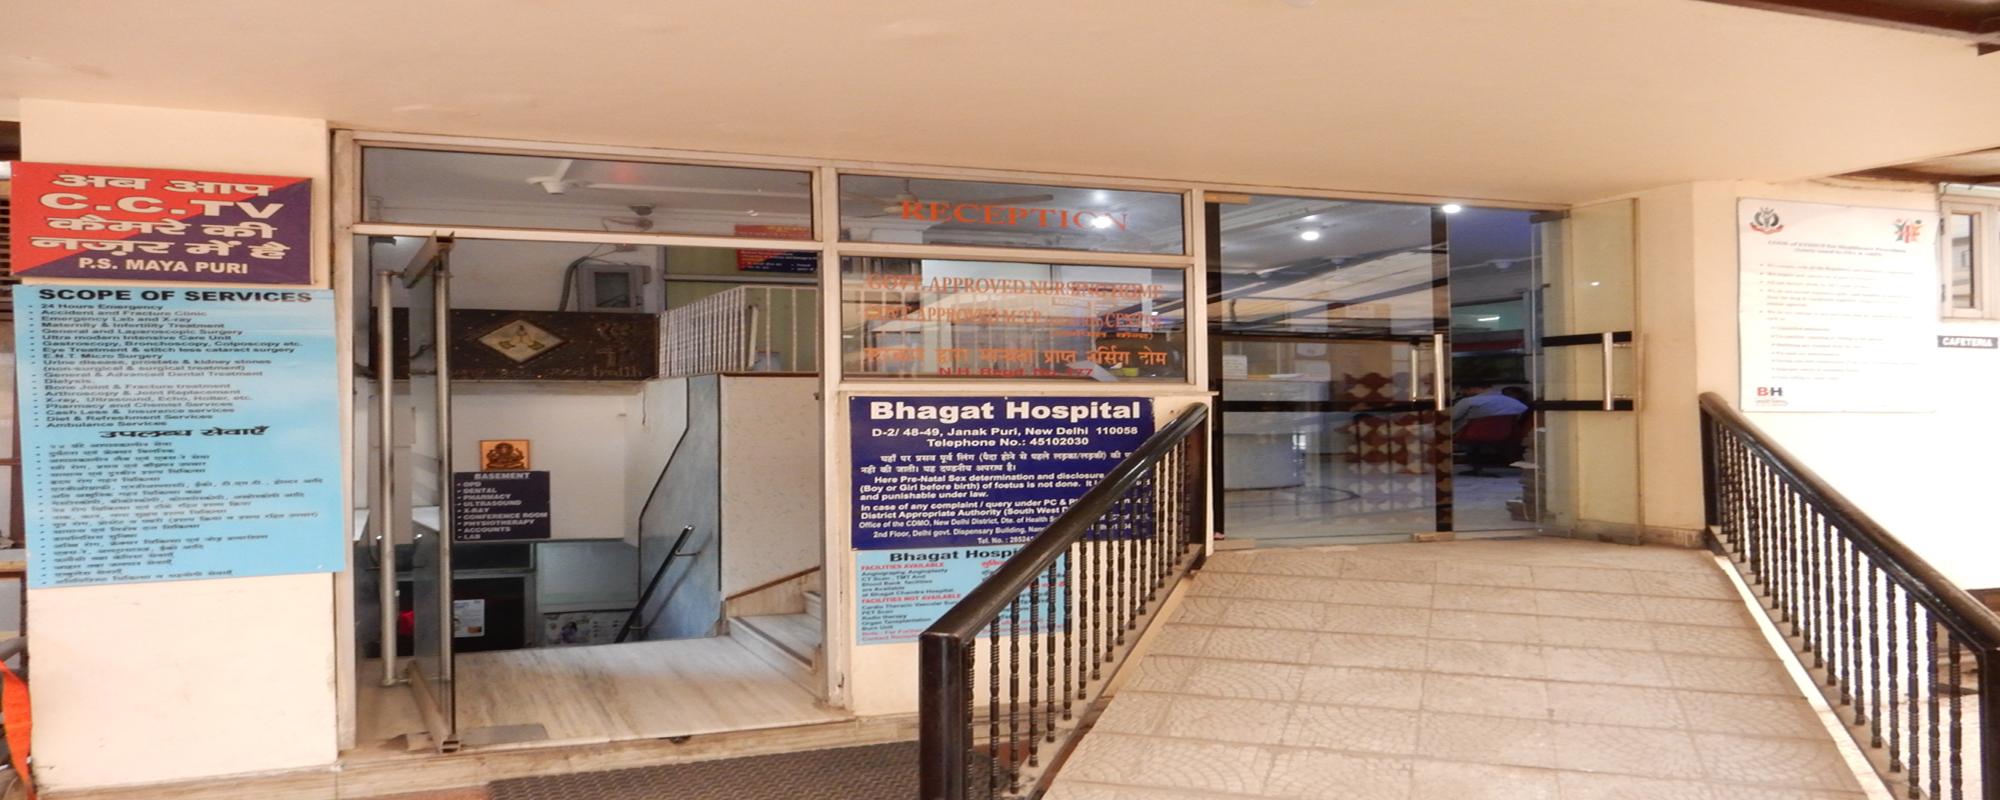 Bhagat Hospital Bhagat Chandra Hospital Welcome To